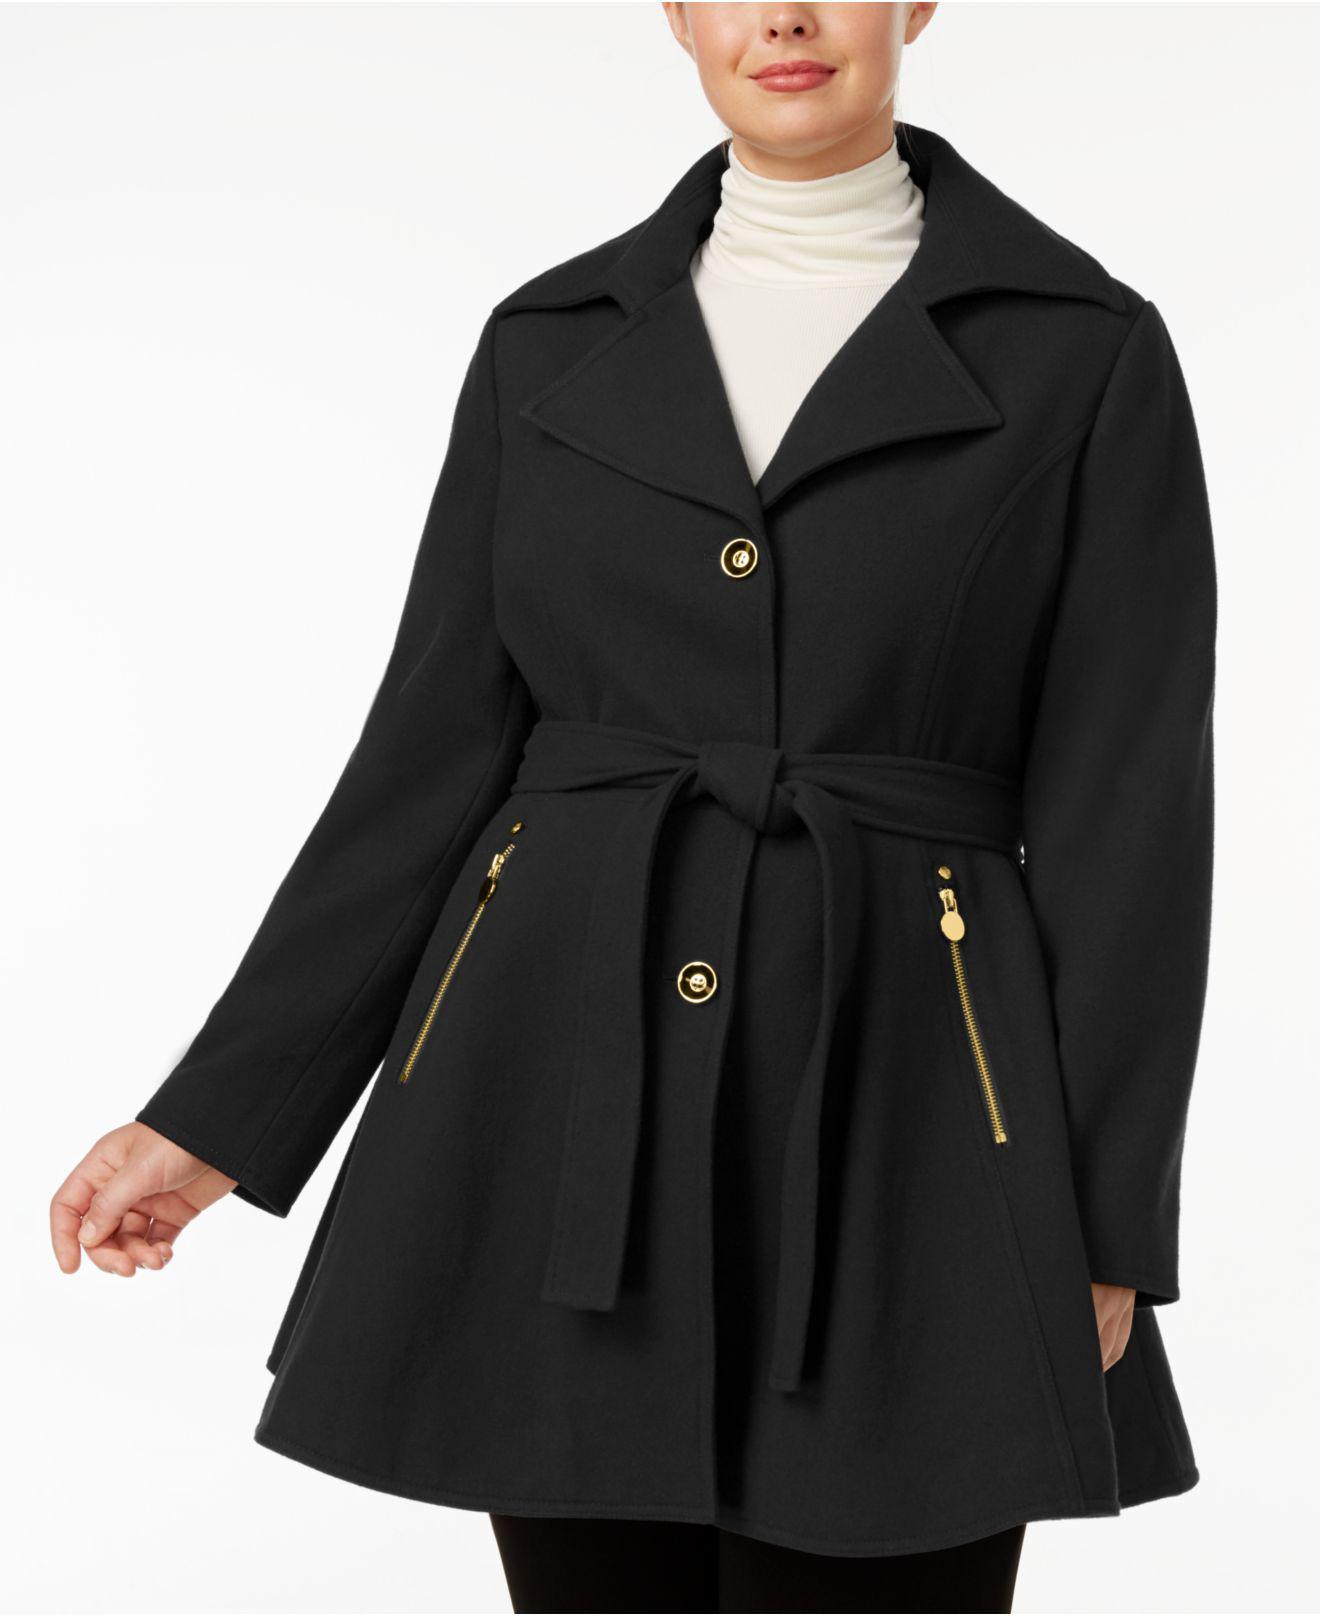 5957a8728b579 INC International Concepts. Women s Black Plus Size Skirted Walker Coat